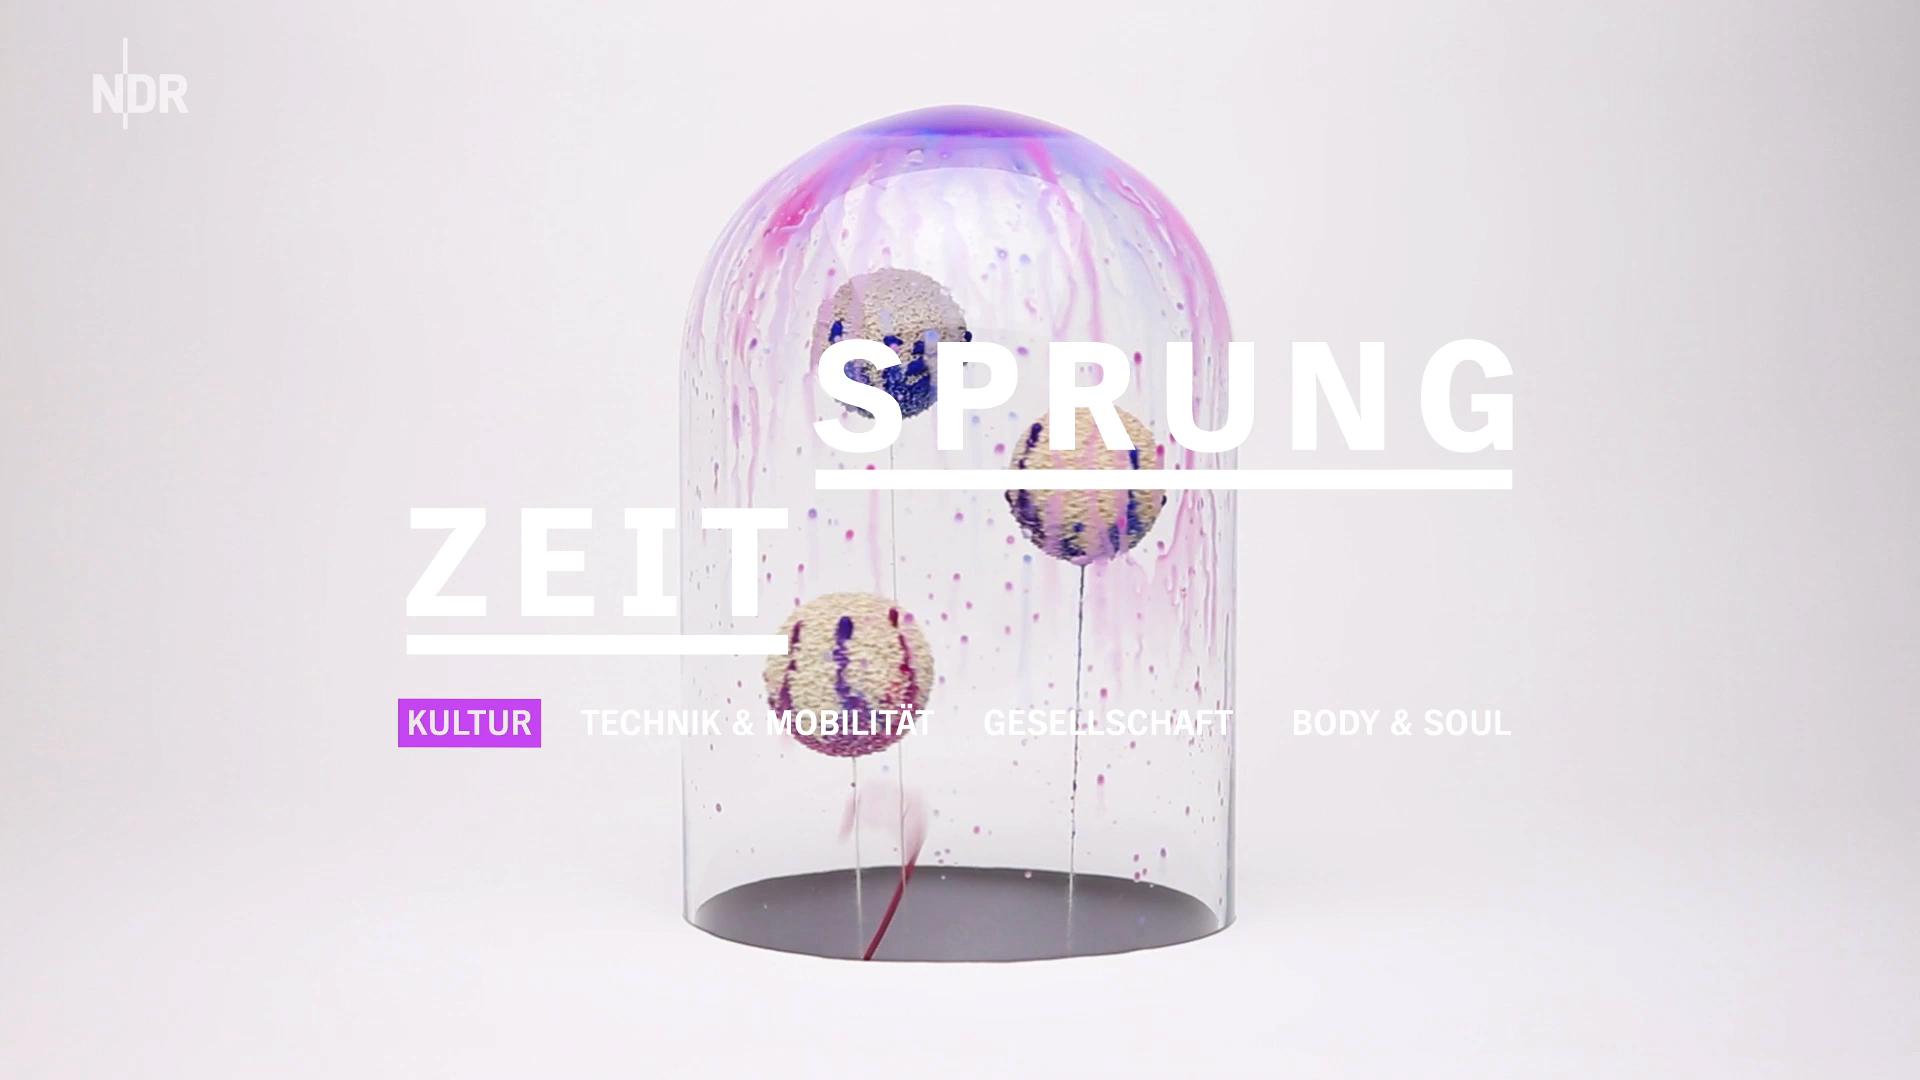 MelanieSpintig_NDR_Zeitsprung_06